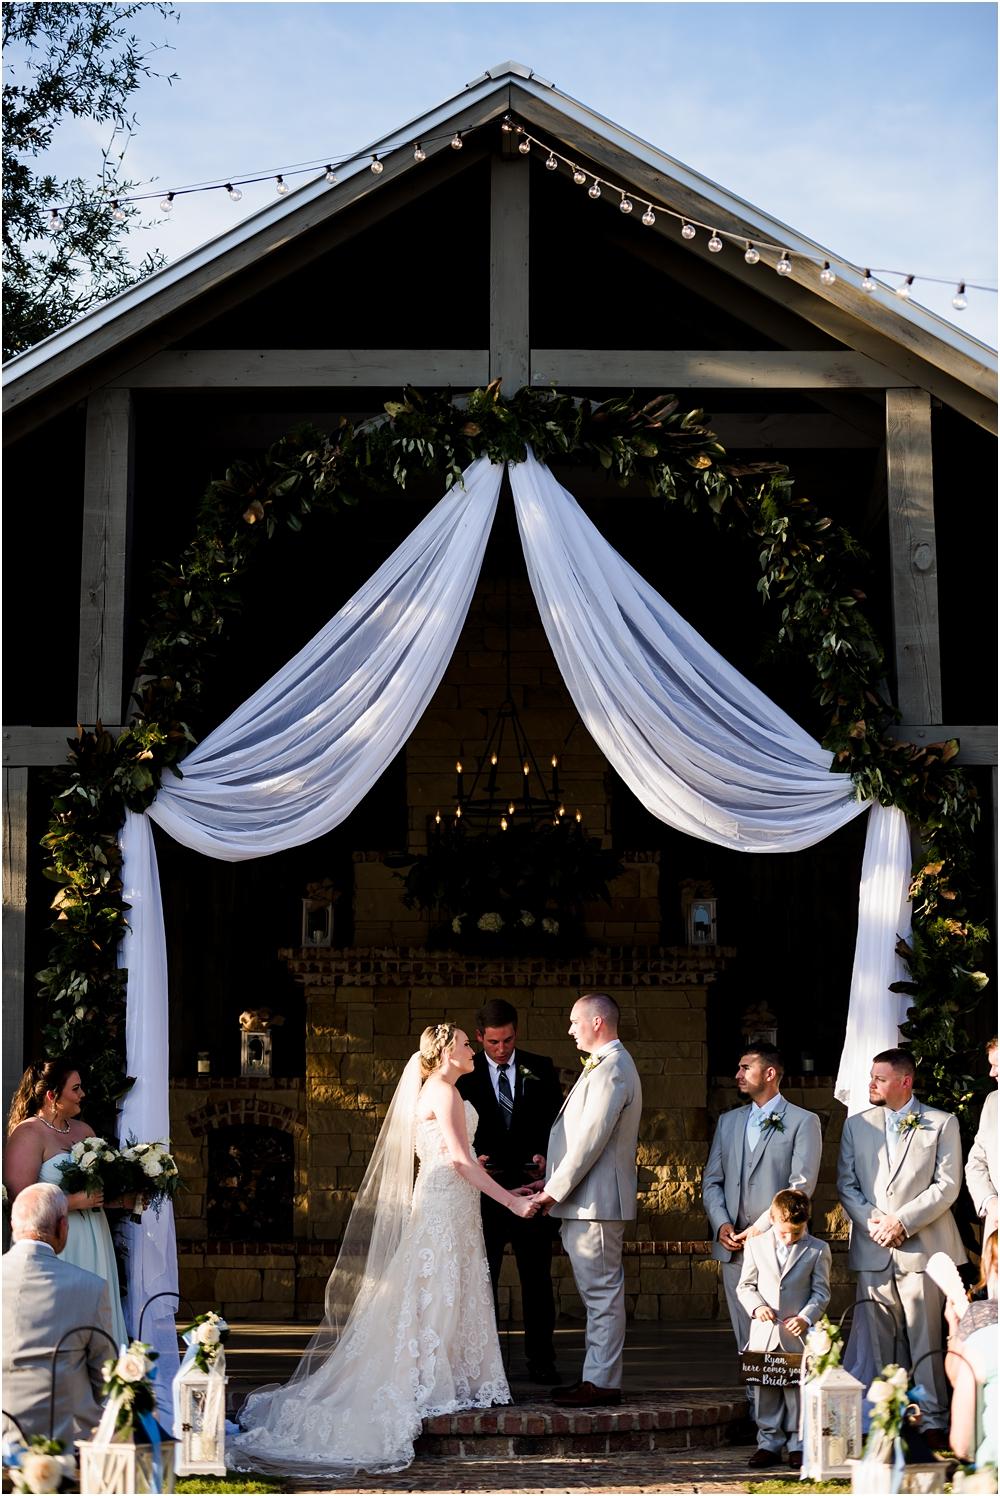 matthew-wedding-kiersten-stevenson-photography-30a-panama-city-beach-dothan-tallahassee-(244-of-579).JPG